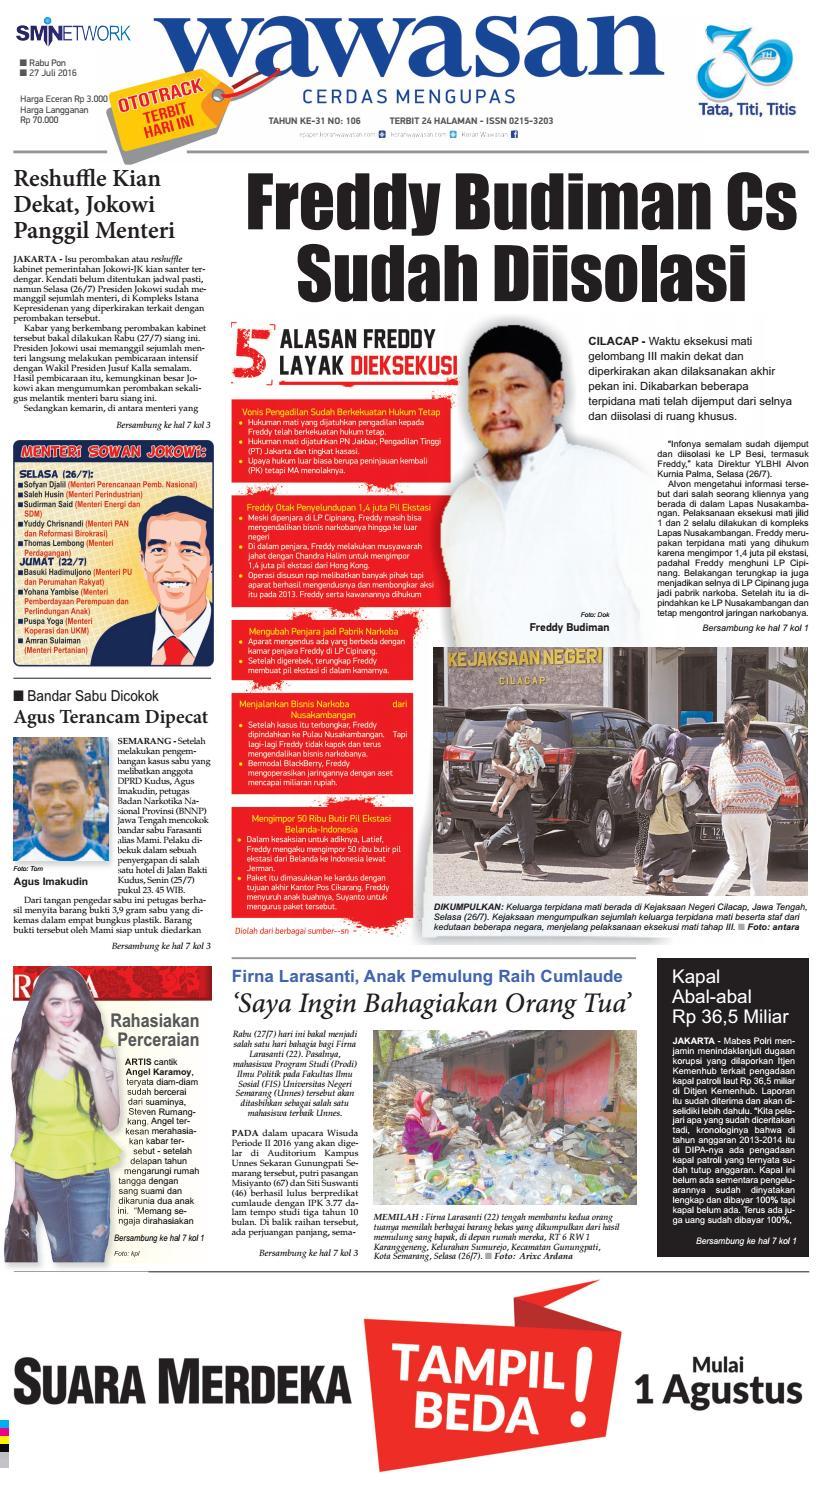 Wawasan 27 Juli 2016 By Koran Pagi Issuu Produk Ukm Bumn Mahkota Papua Bin Syowi